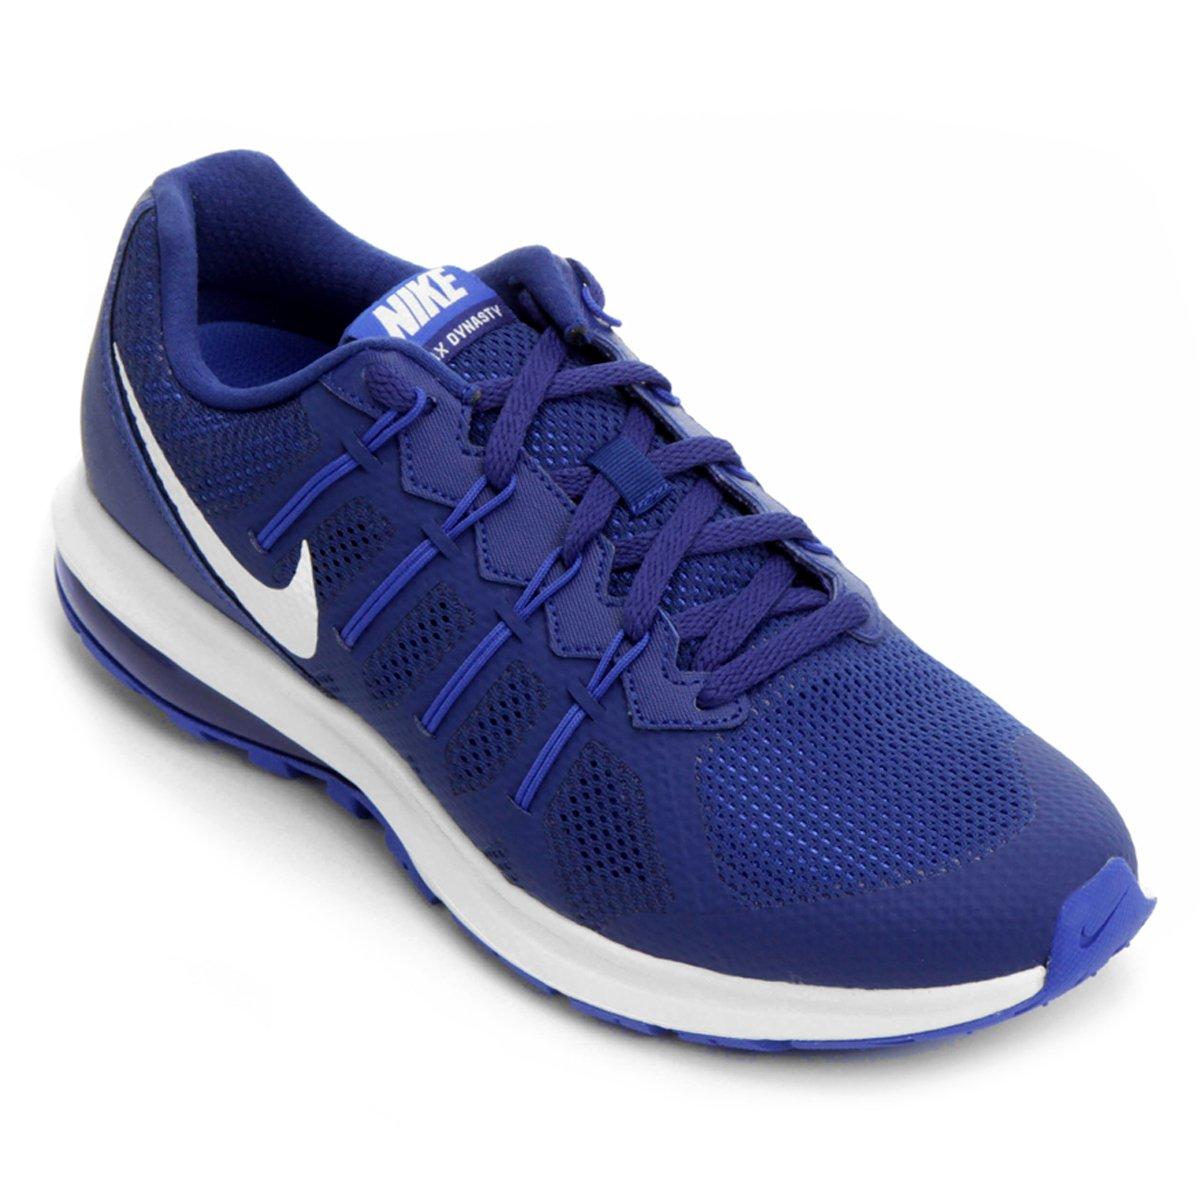 tenis nike azul e branco